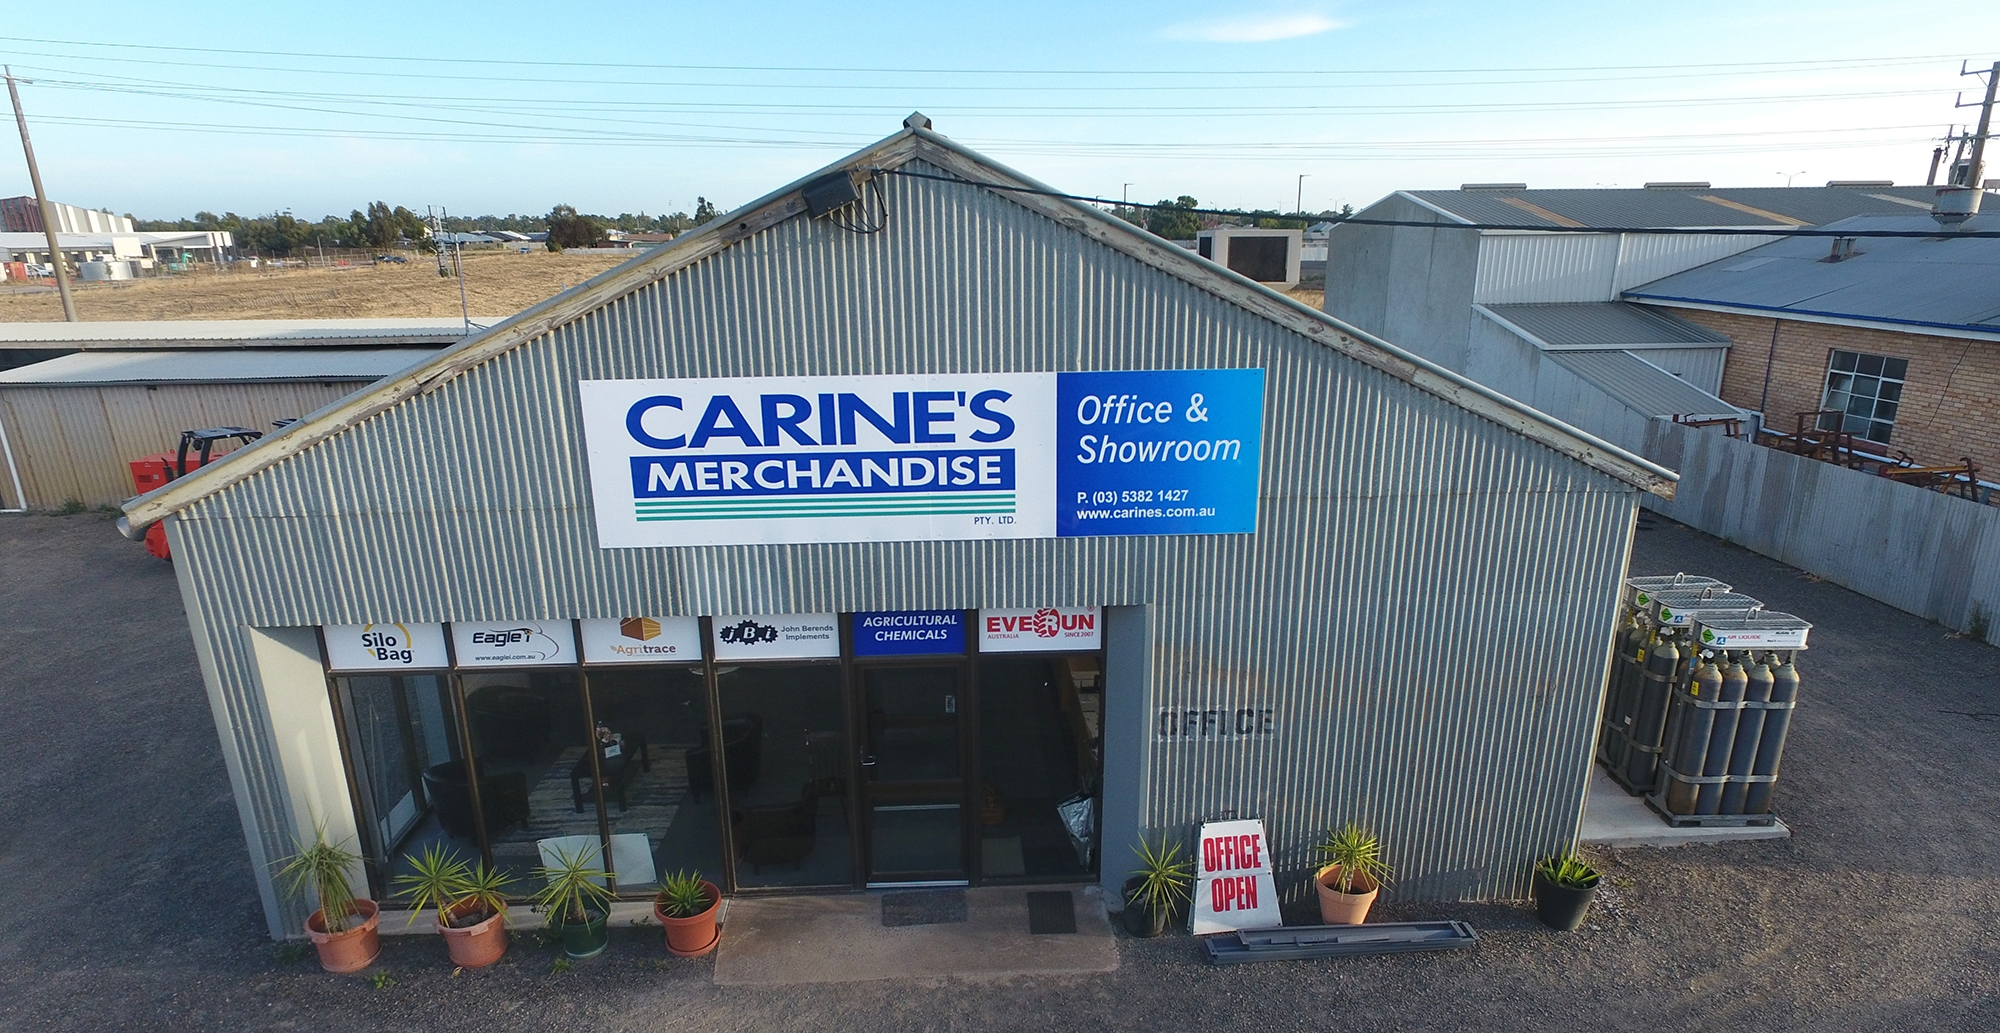 Carines-merchandise-specials